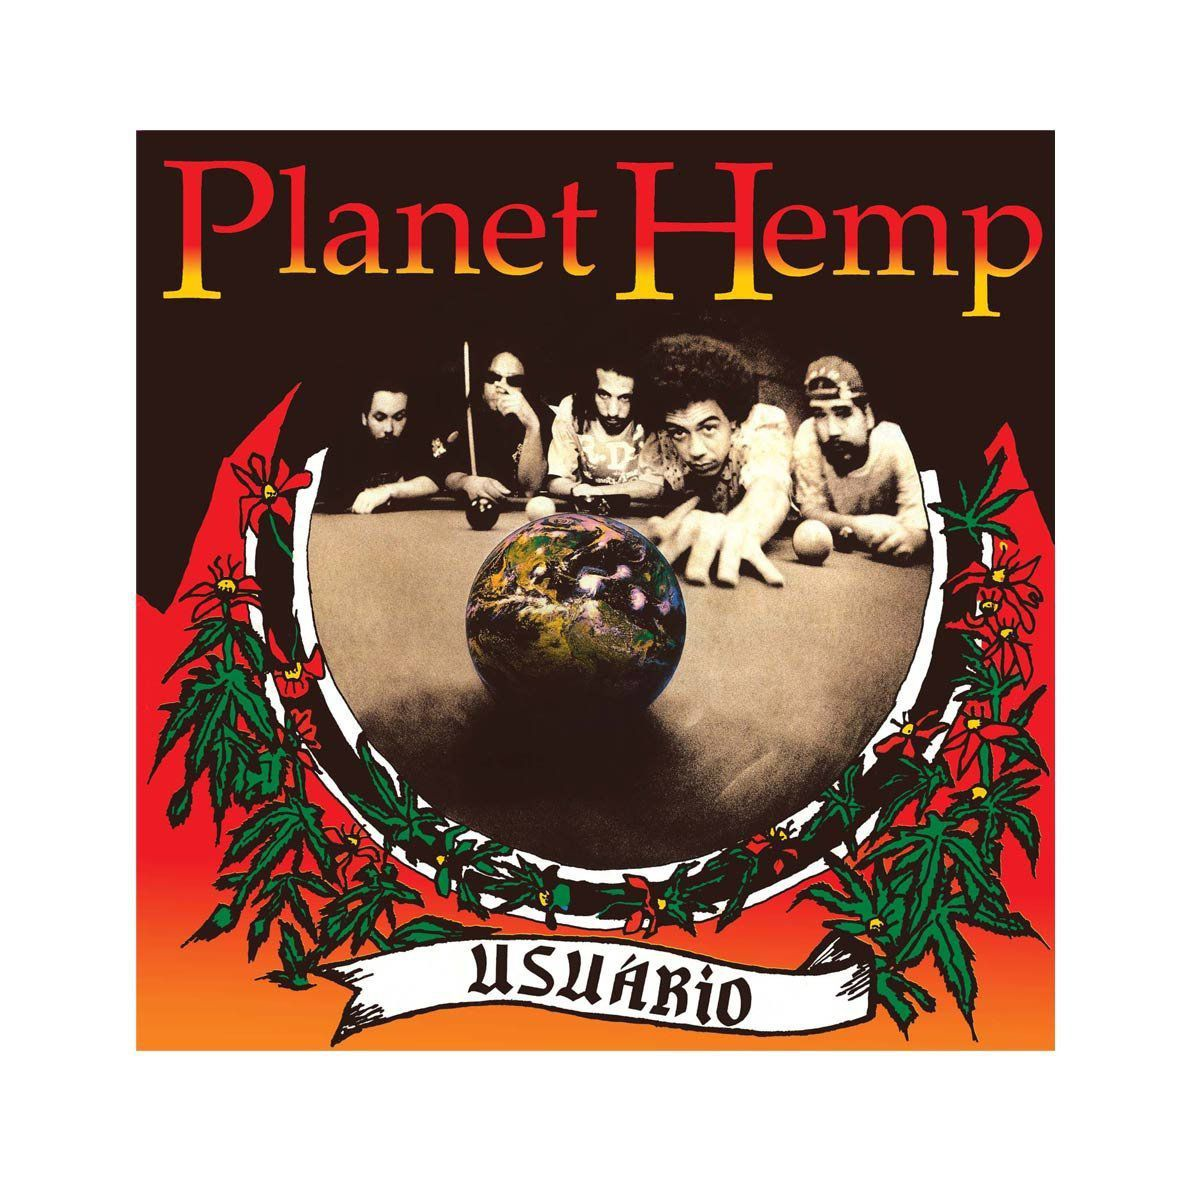 LP Planet Hemp Usuário  - bandUP Store Marketplace